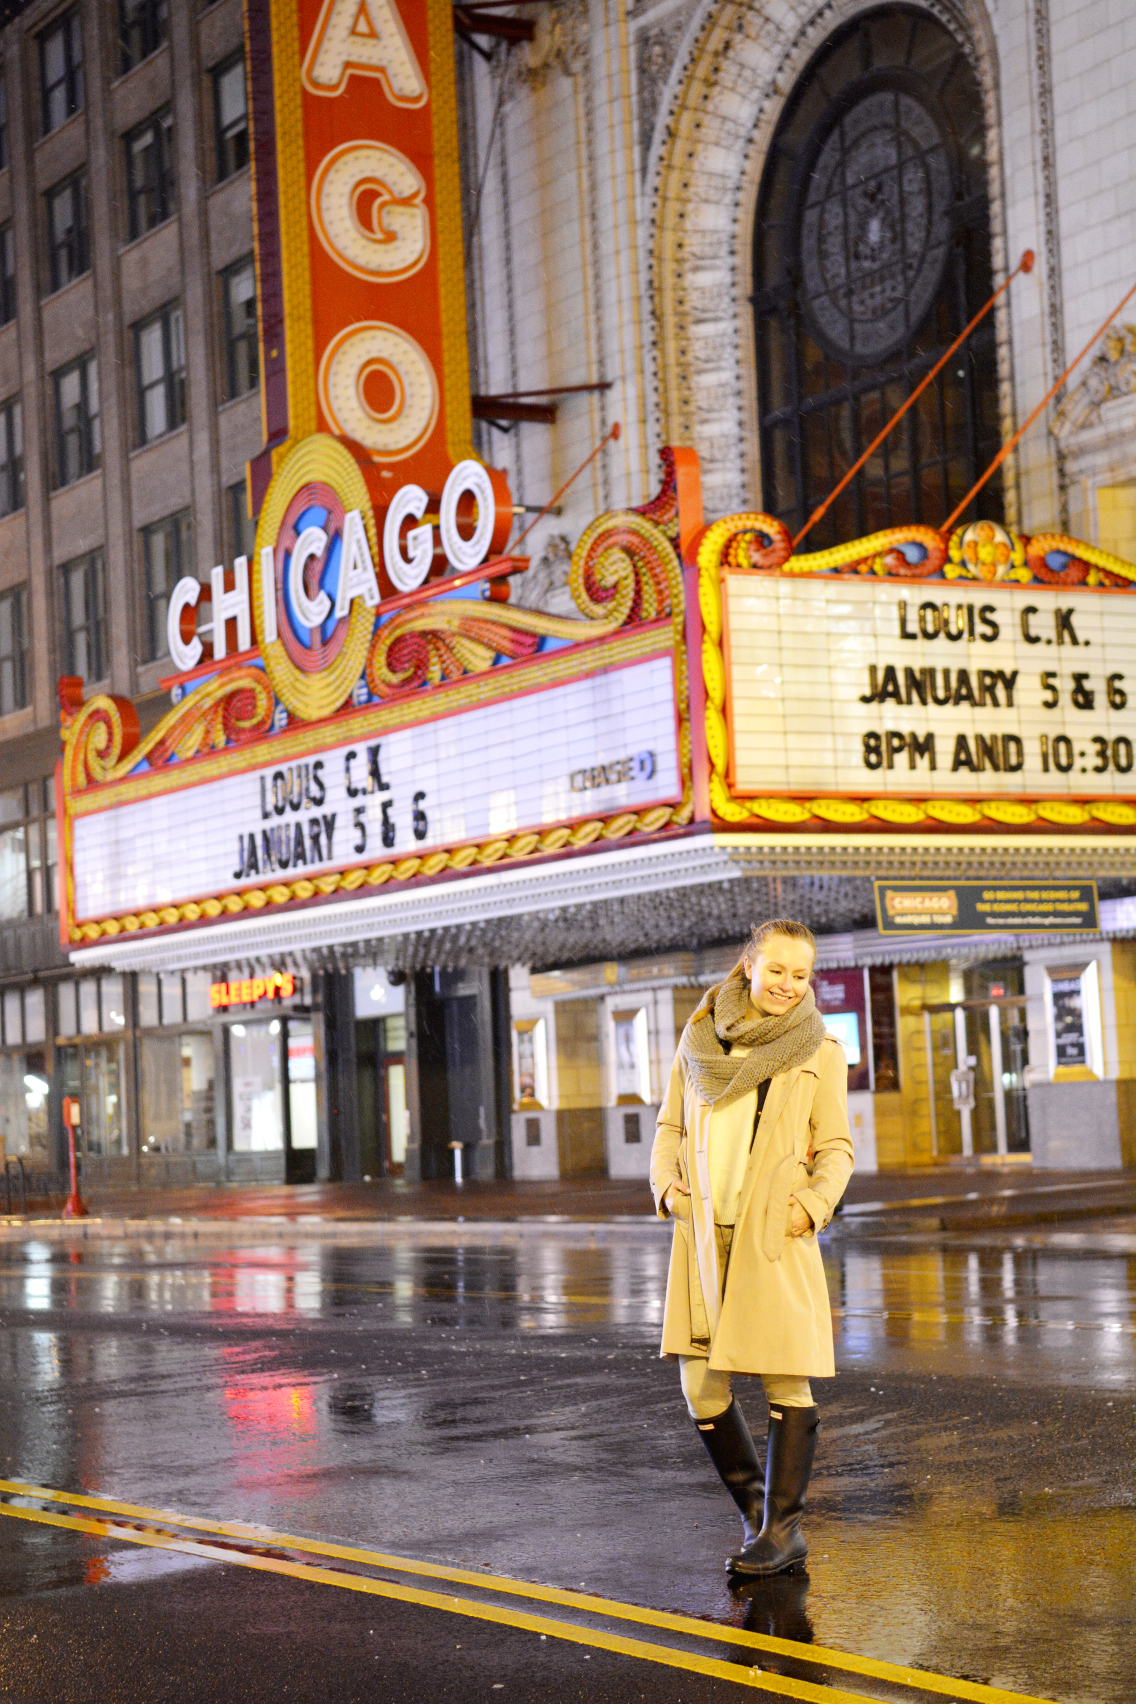 Chicago Theatre with Sed Bona 8